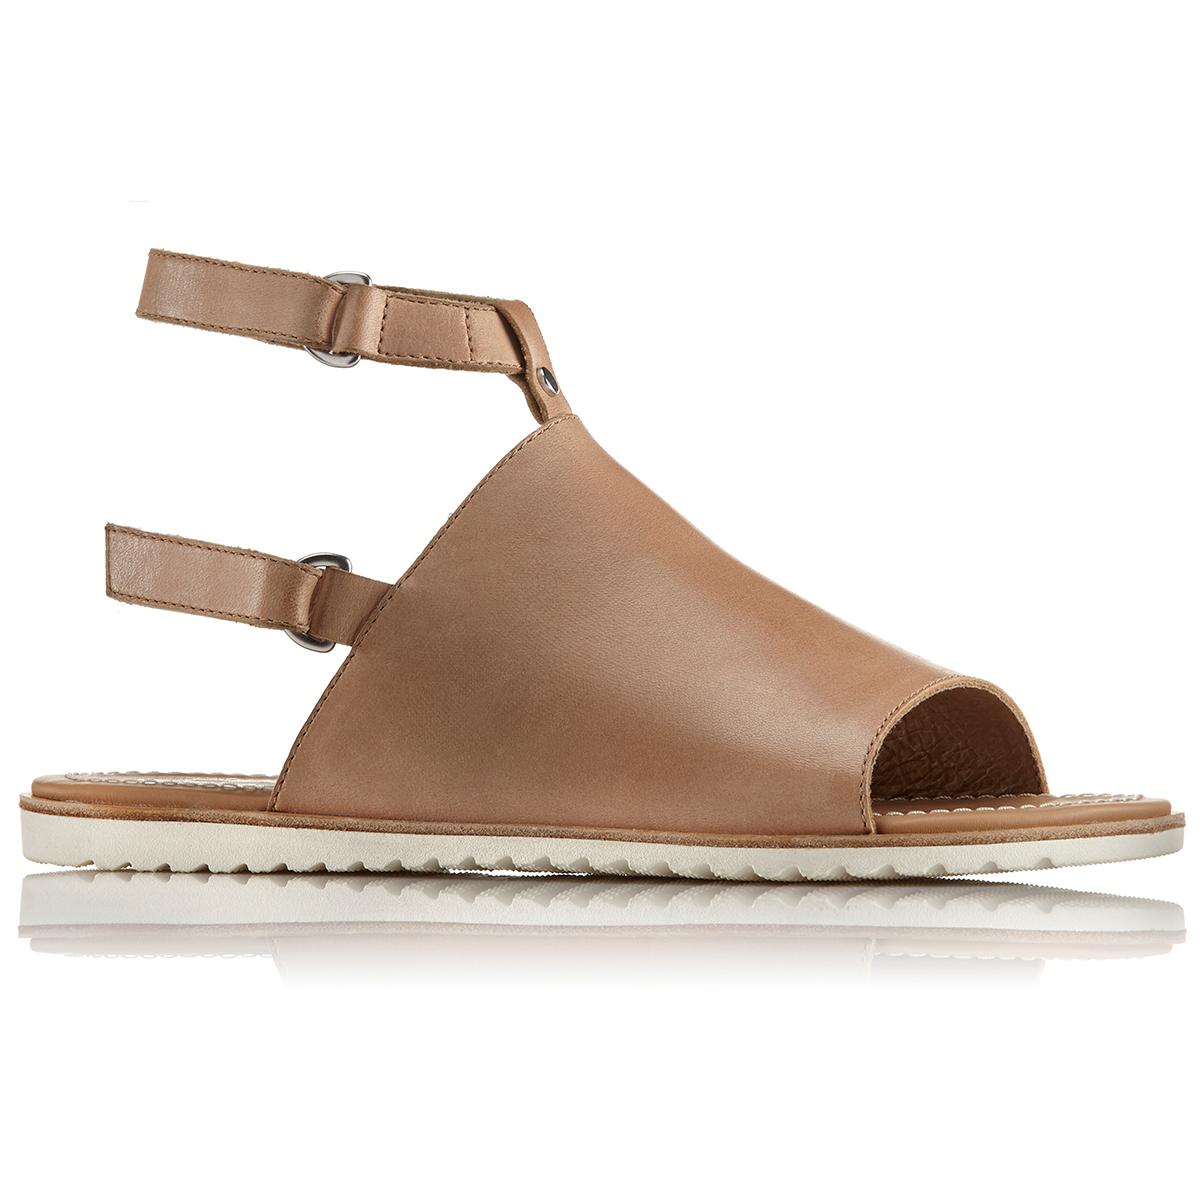 Sorel Women's Ella Mule Strap Sandals - Brown, 11